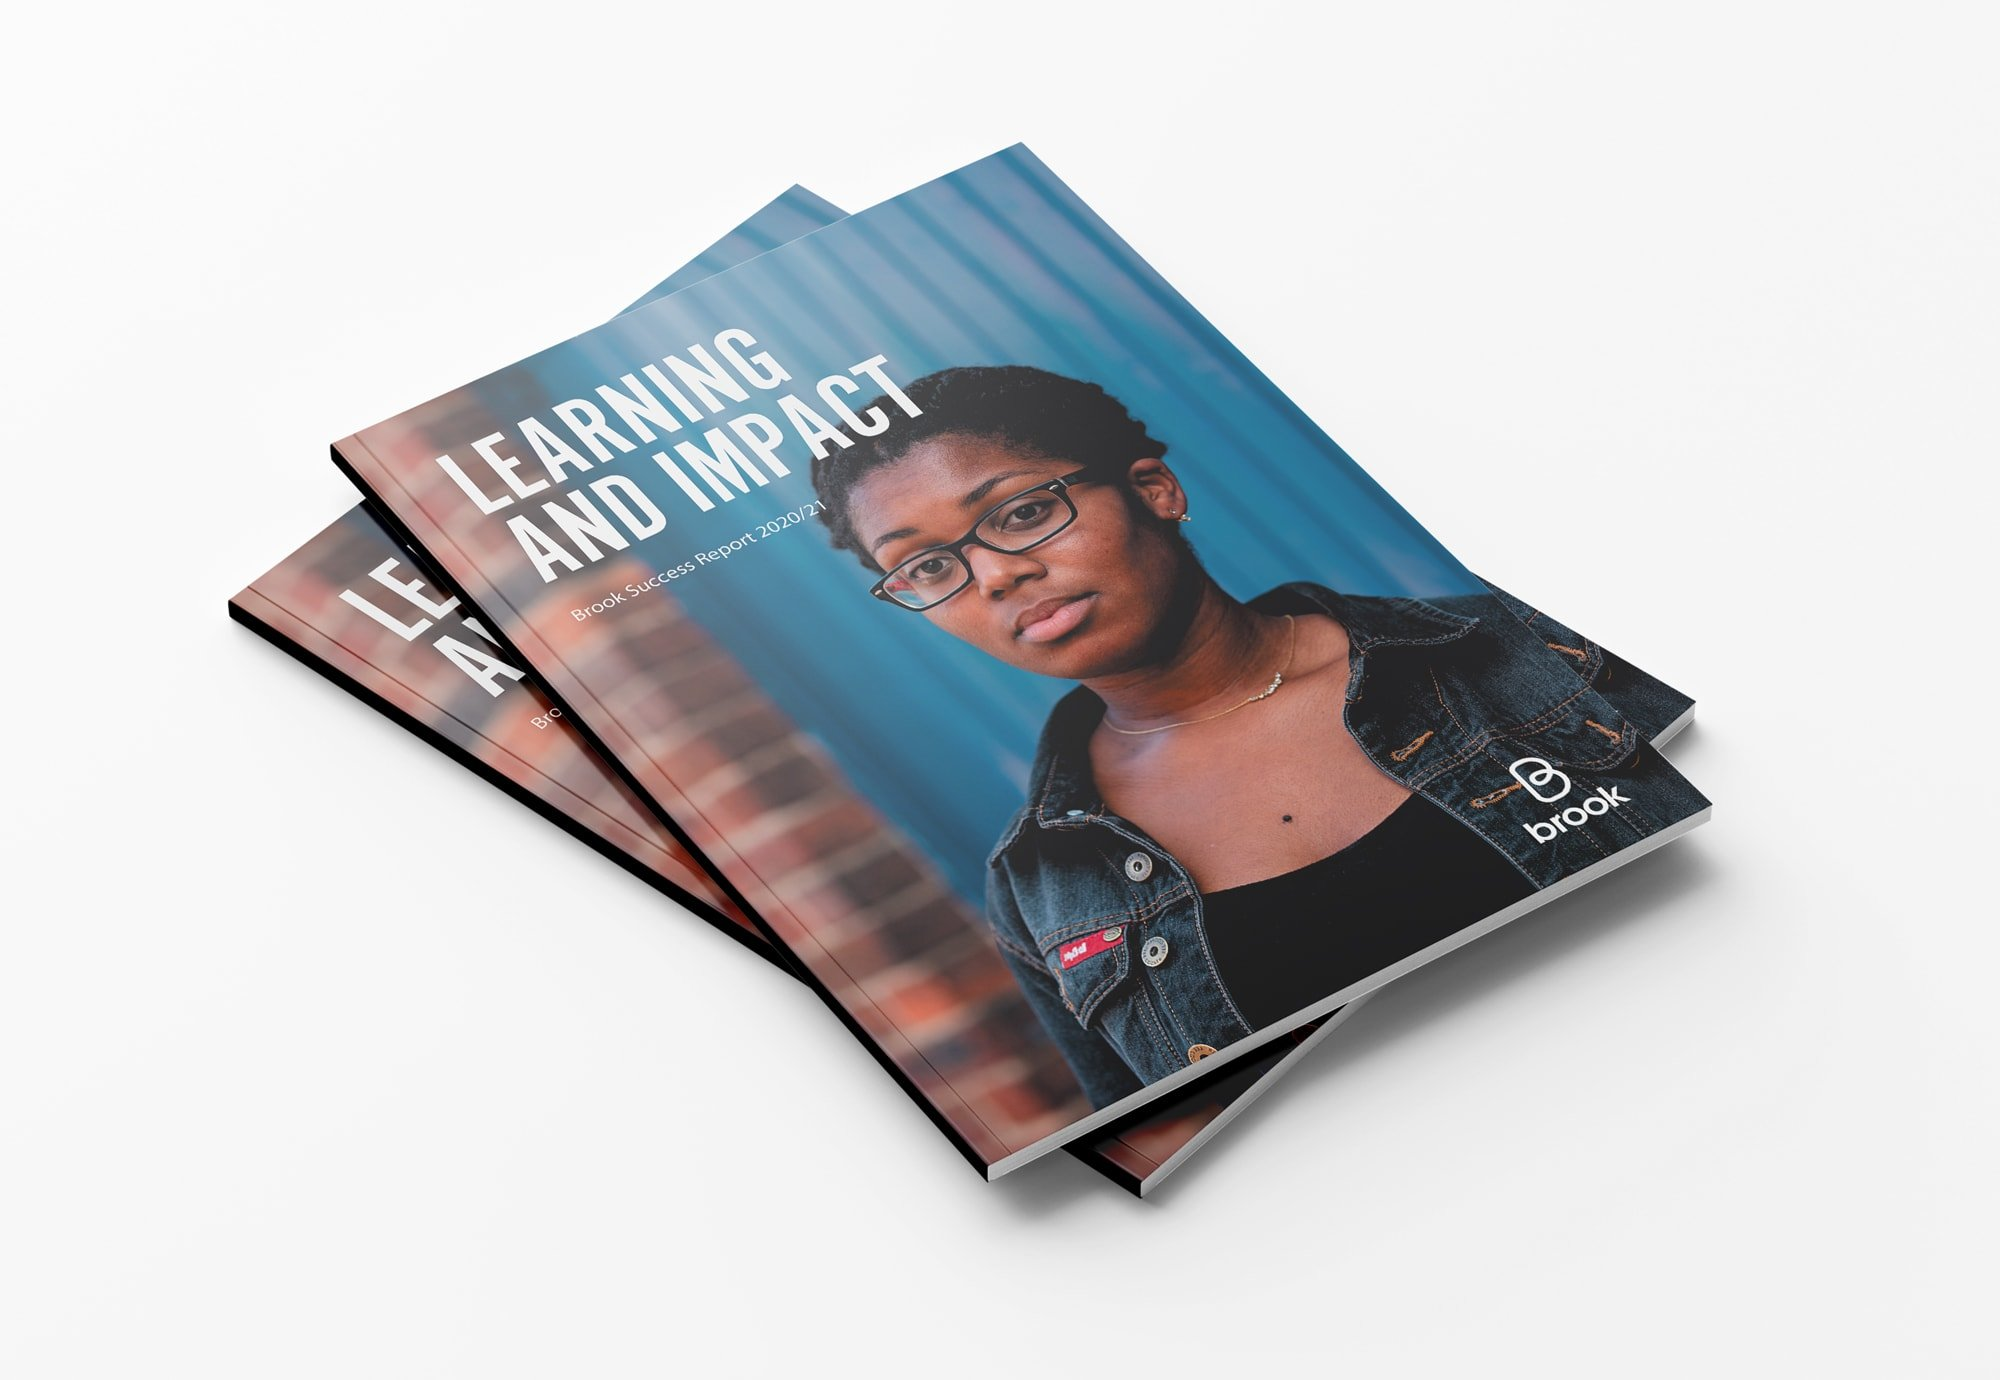 Brook success report cover